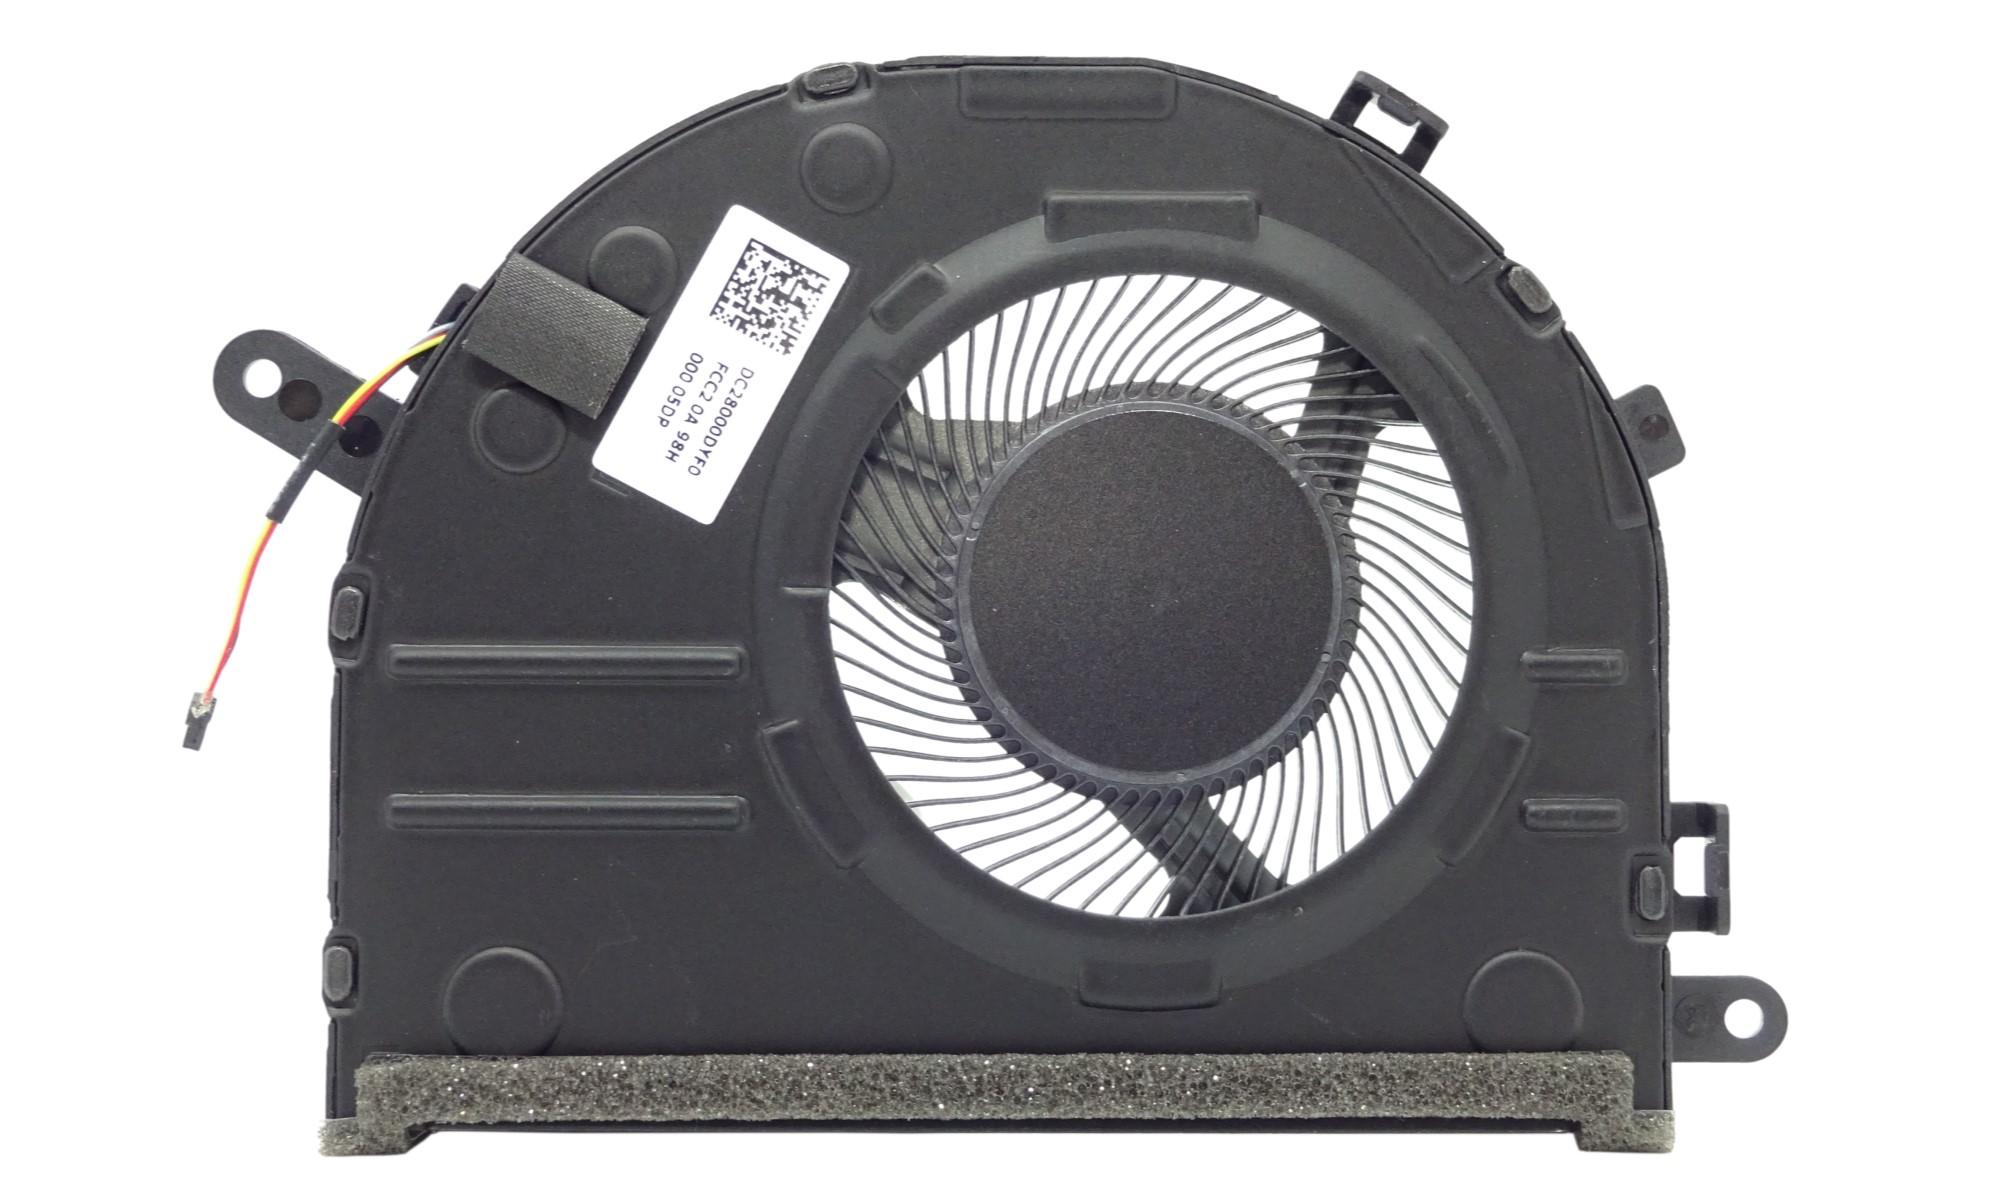 Cooler compatibil Lenovo IdeaPad 330S-14AST, 330S-14IKB, 330S-15ARR, 330S-15AST, 330S-15IKB